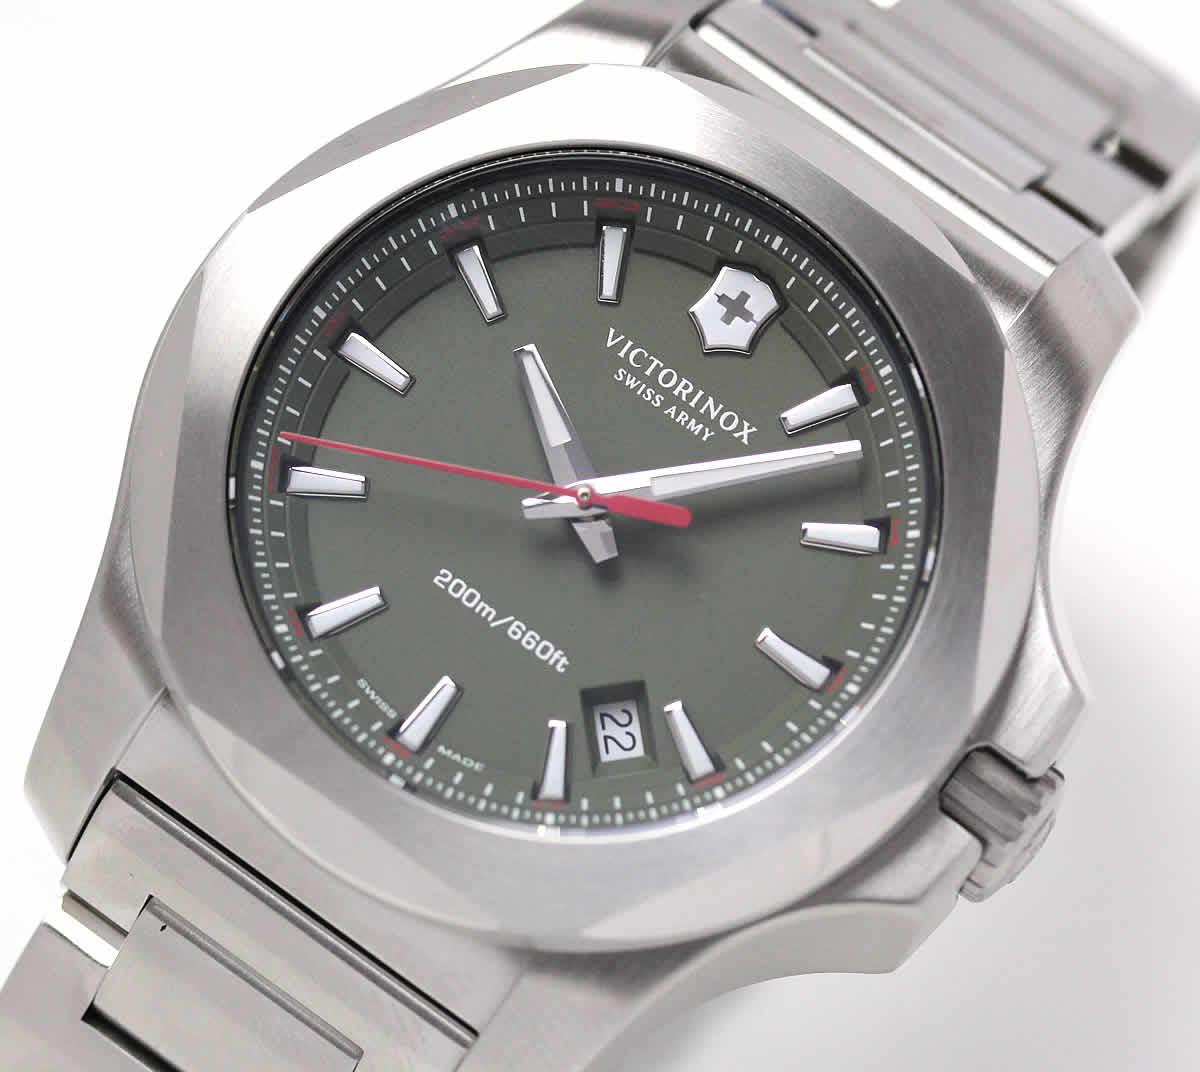 INOX ビクトリノックス グリーンカラー 腕時計